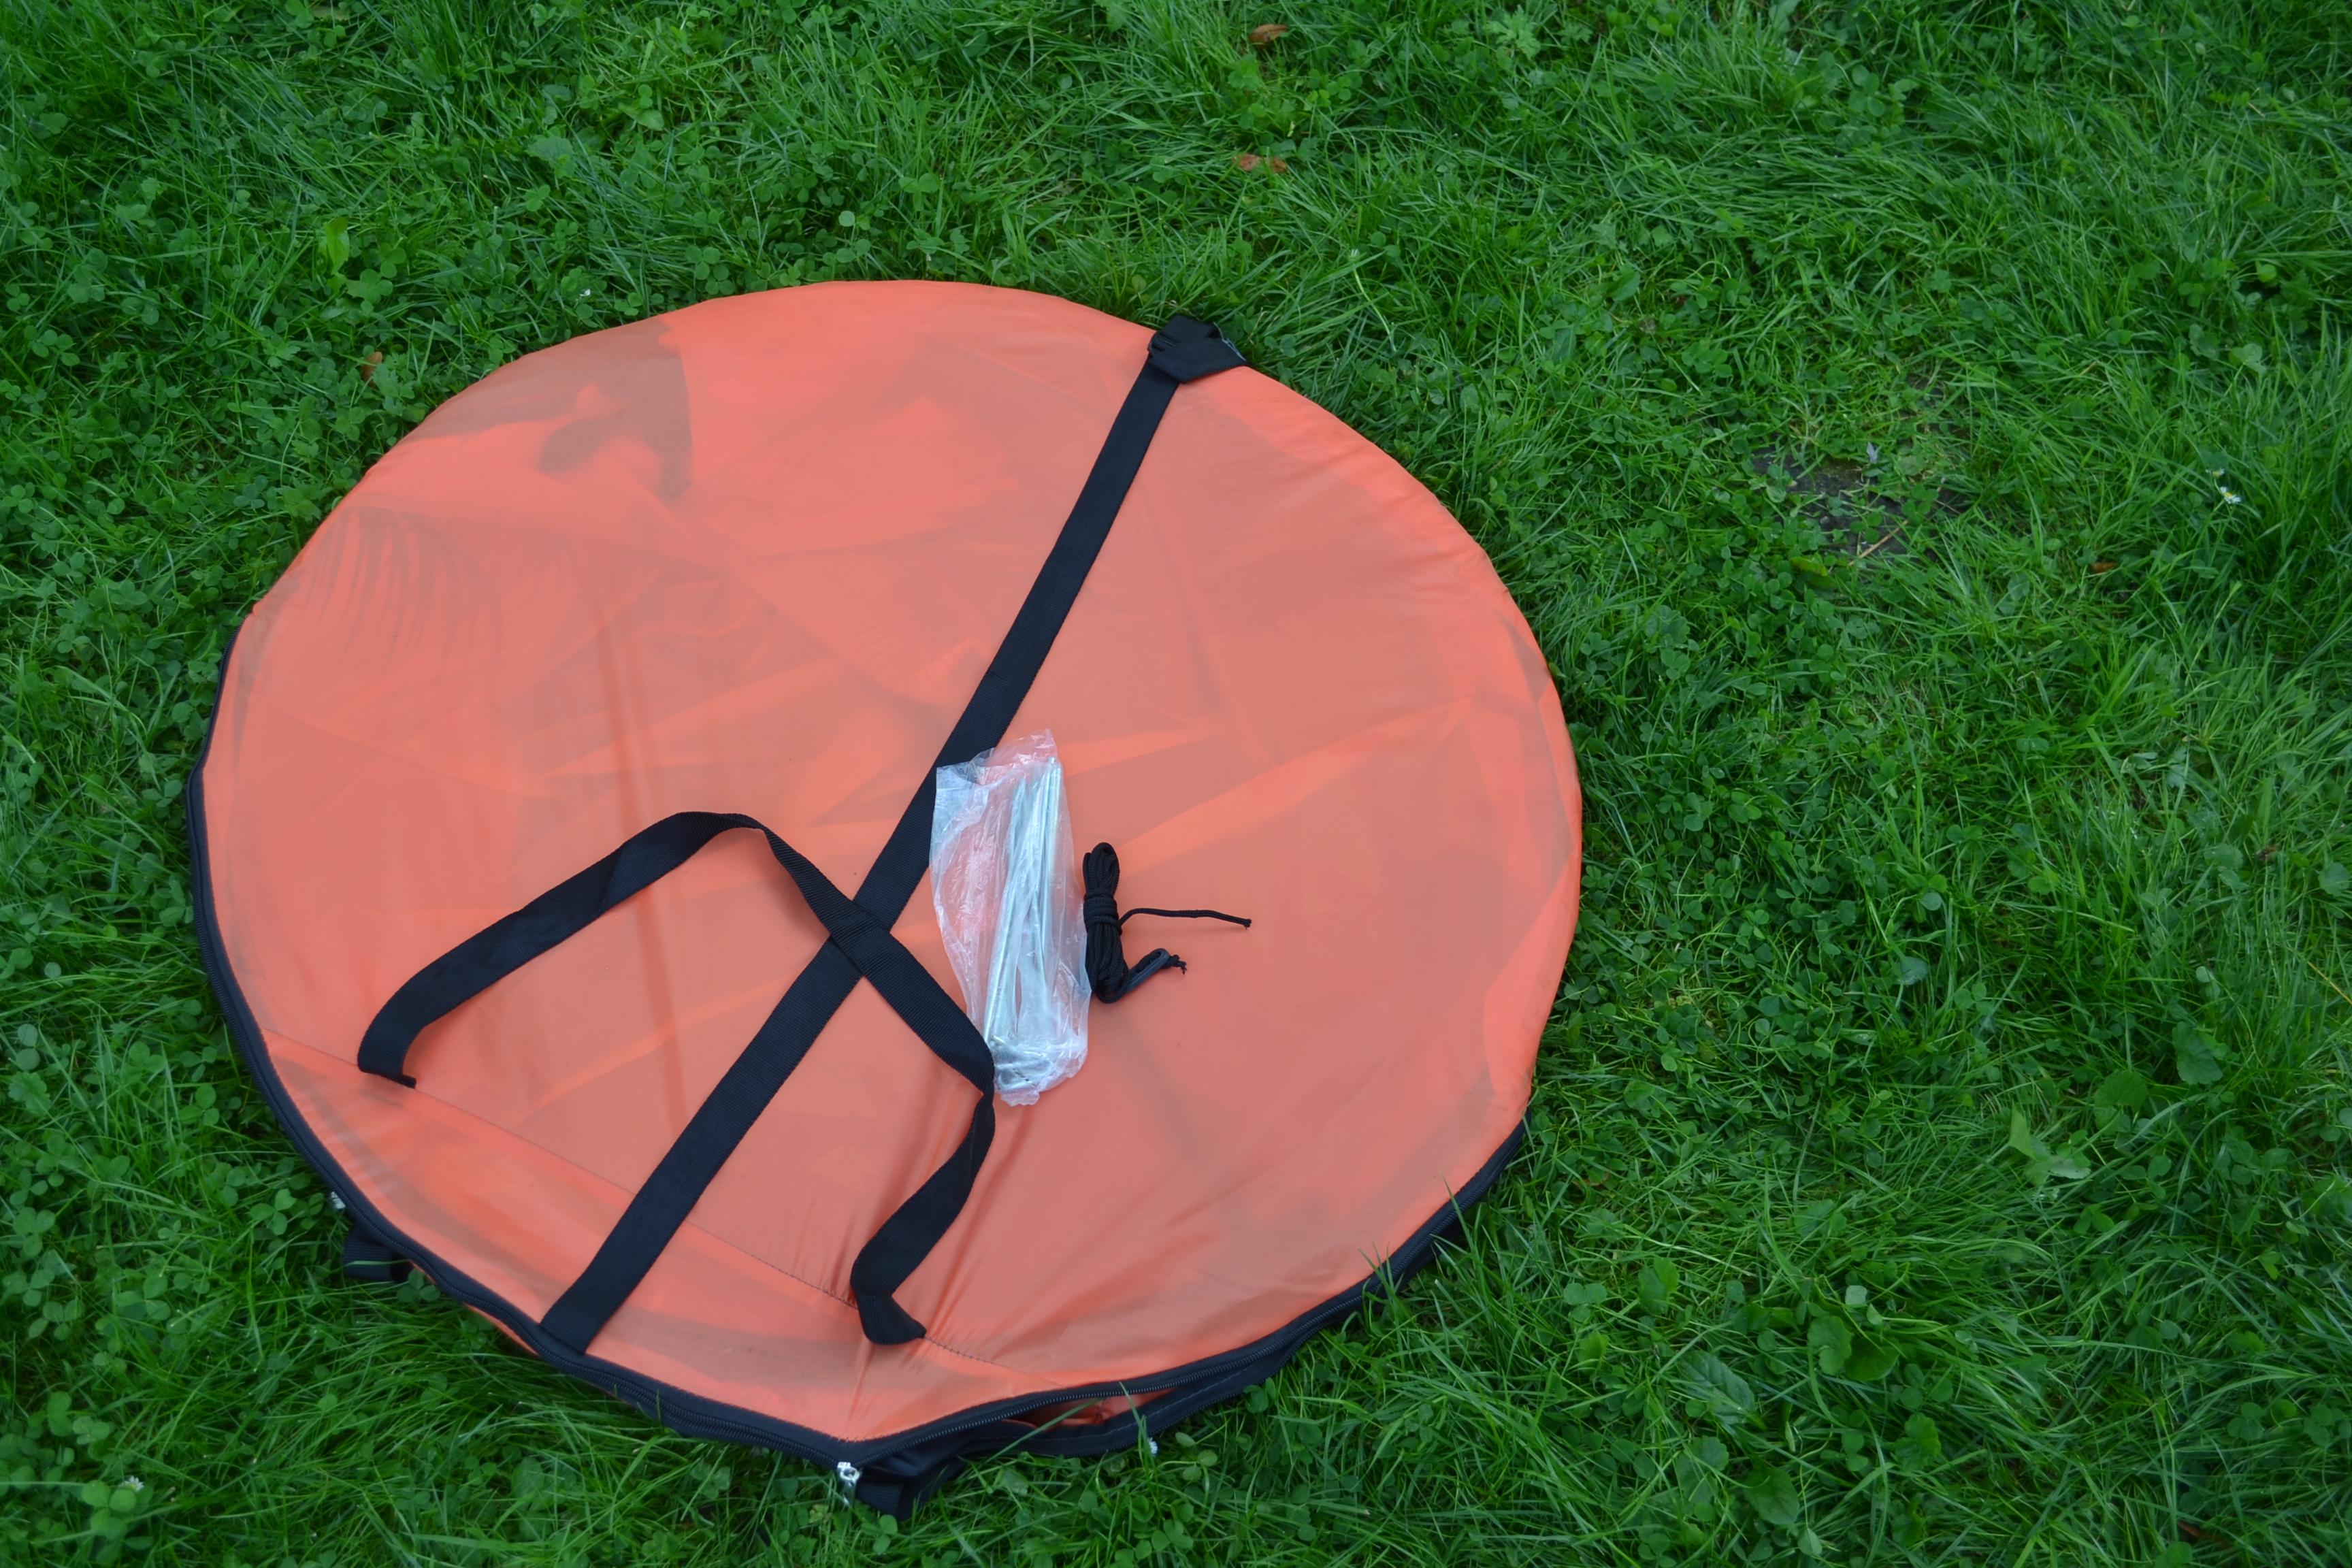 Wurfzelt Sekundenzelt 2-3 Person Outdoor Campingzelt Tent Pop Up 245x145x110cm Orange